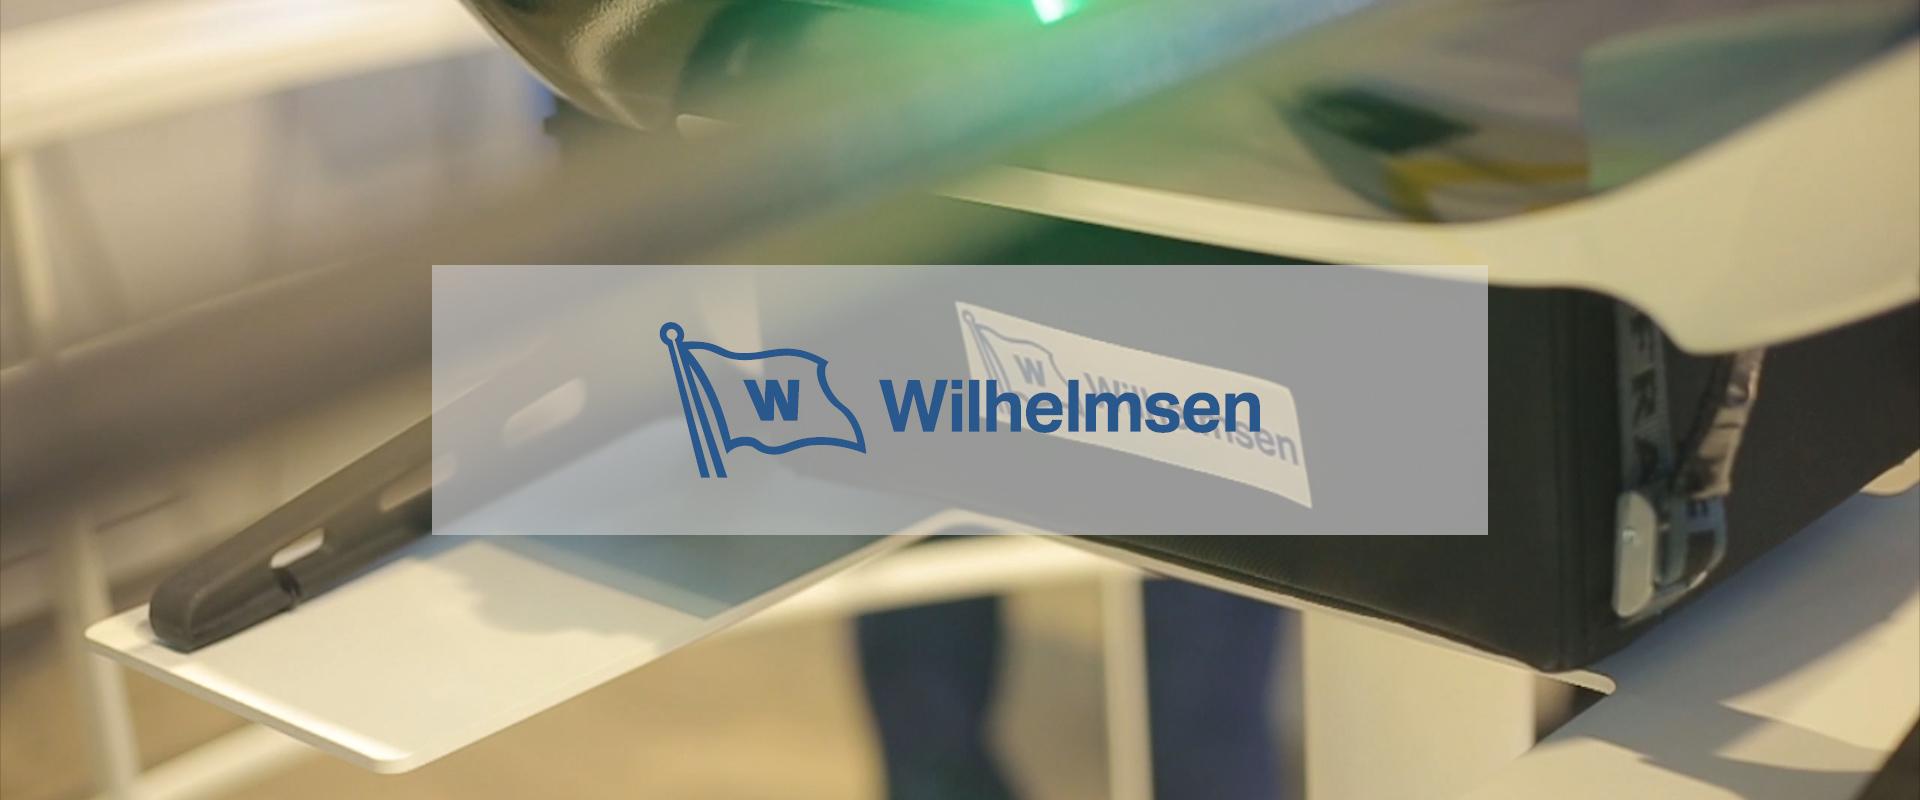 Wilhelmsens ship drone airbus